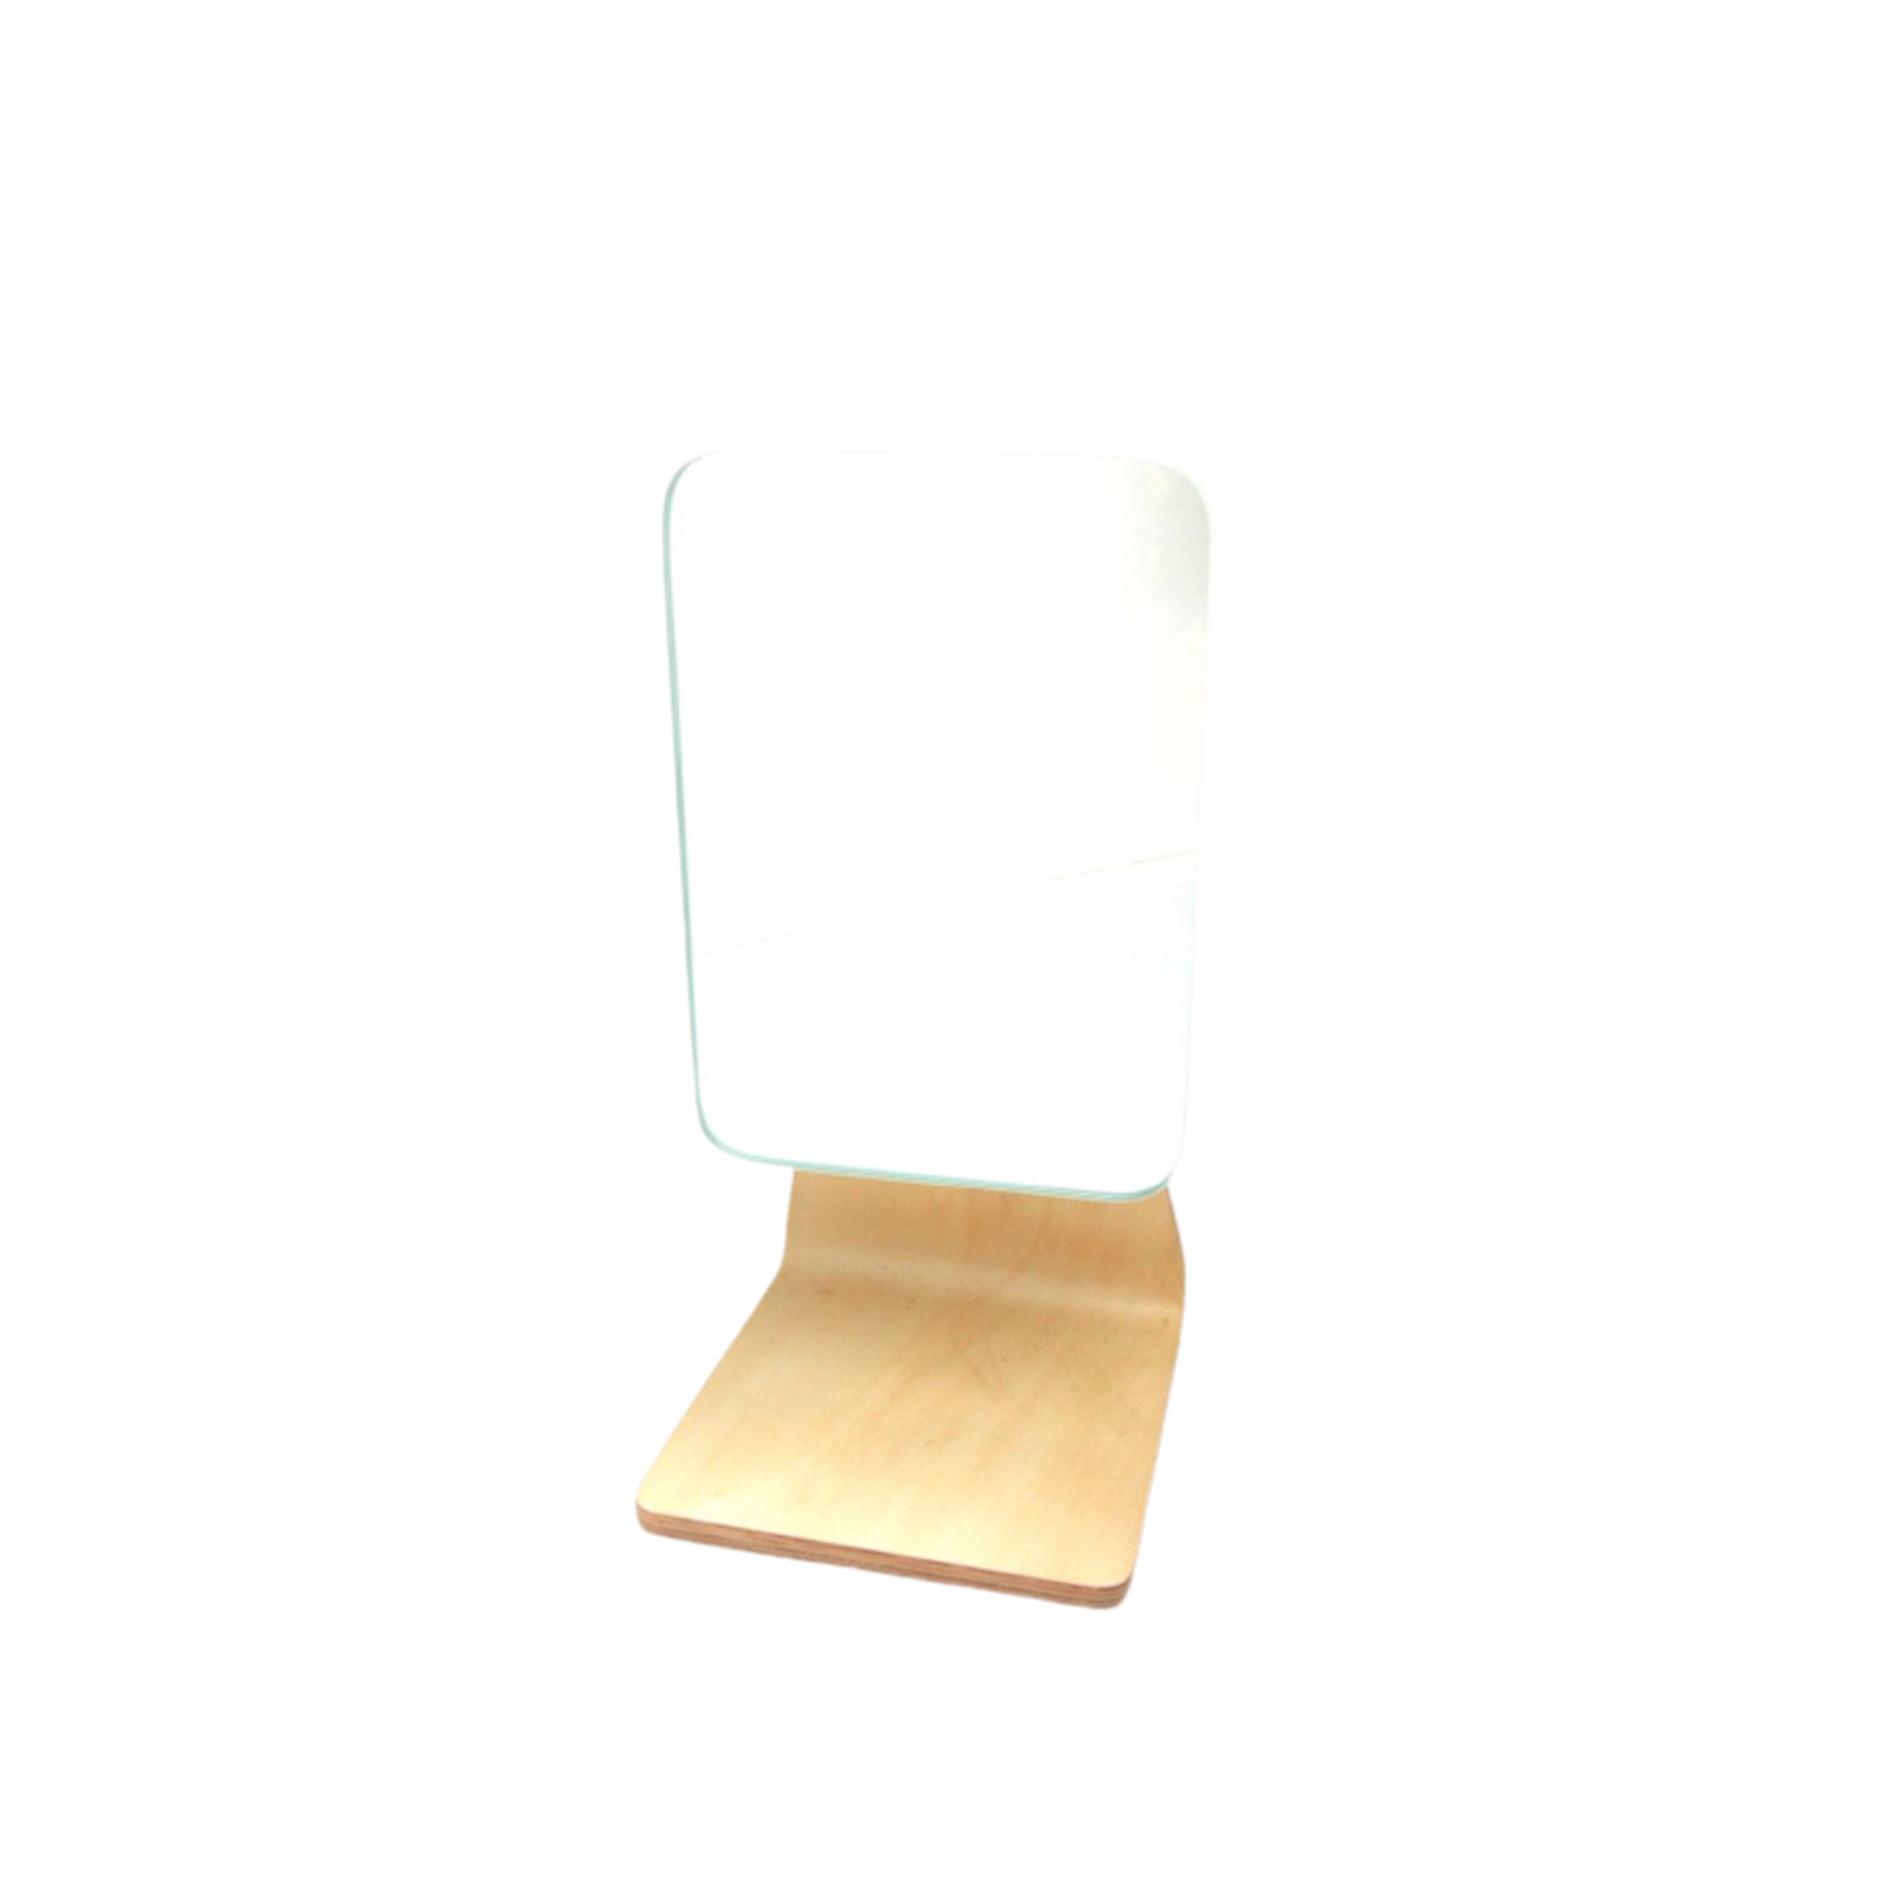 Specchio da bagno base in bamboo, Trasparente, large image number 0